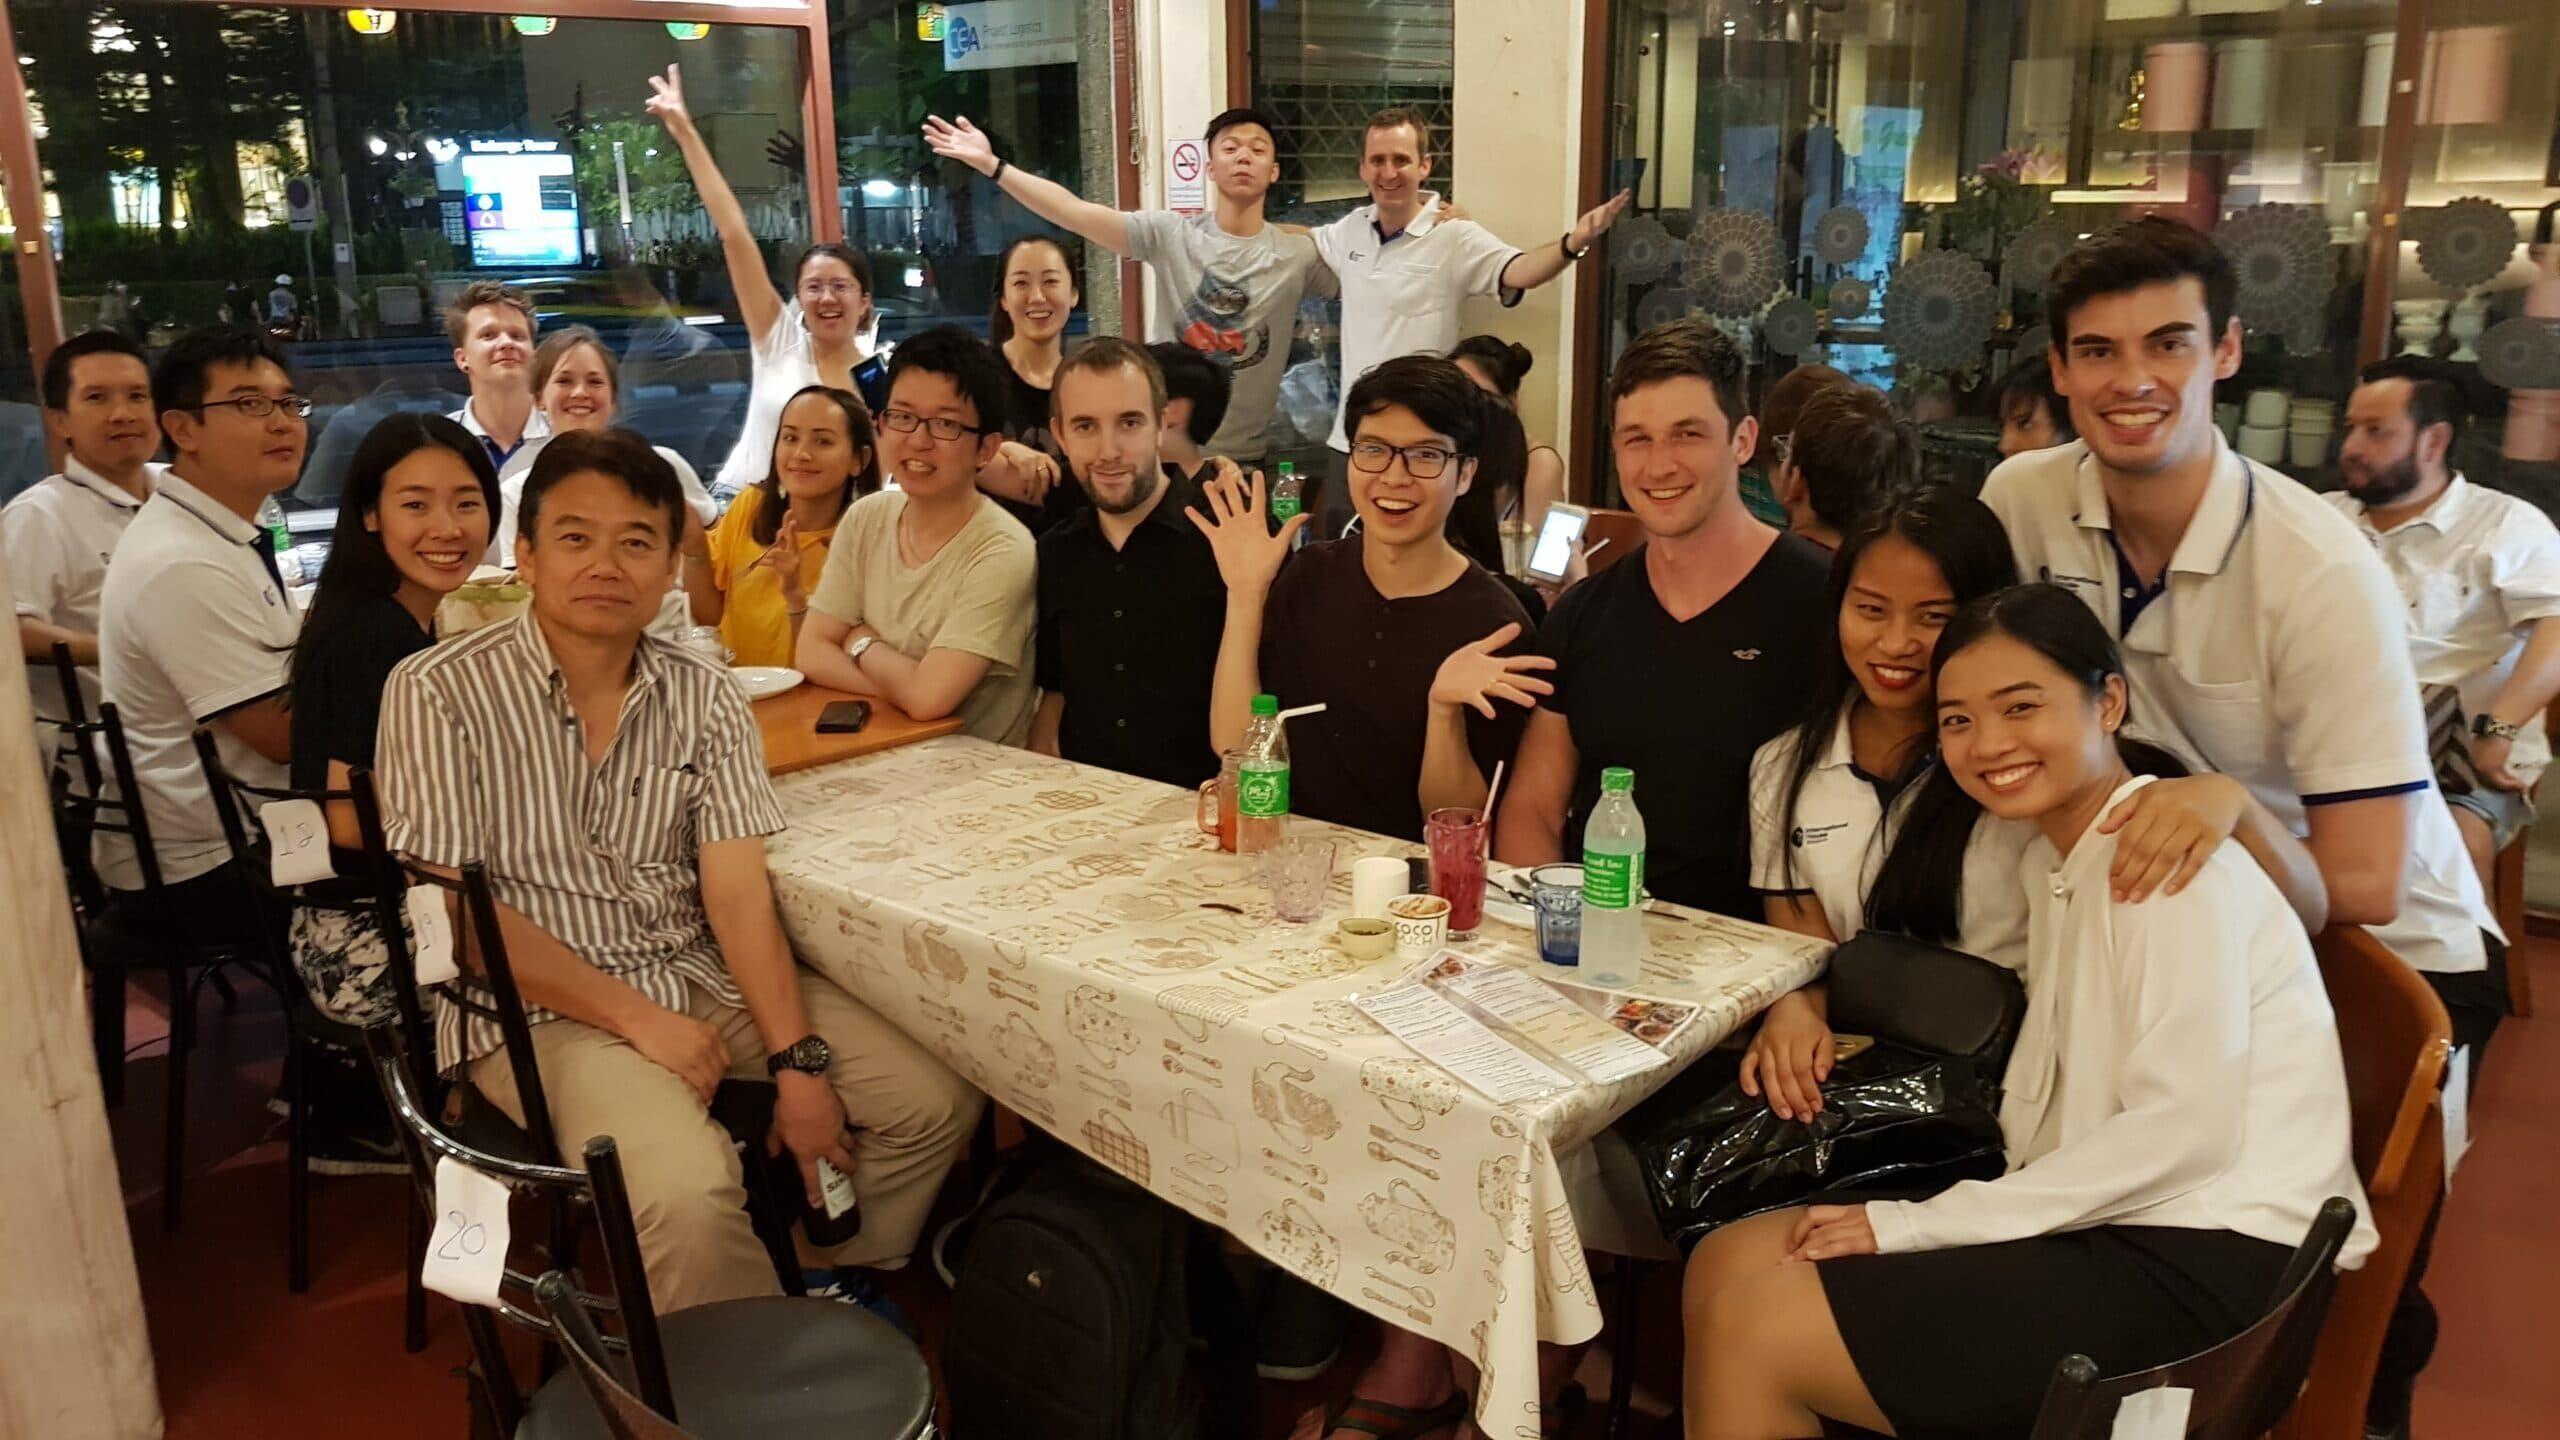 Study Holiday 6 – Social Dinner